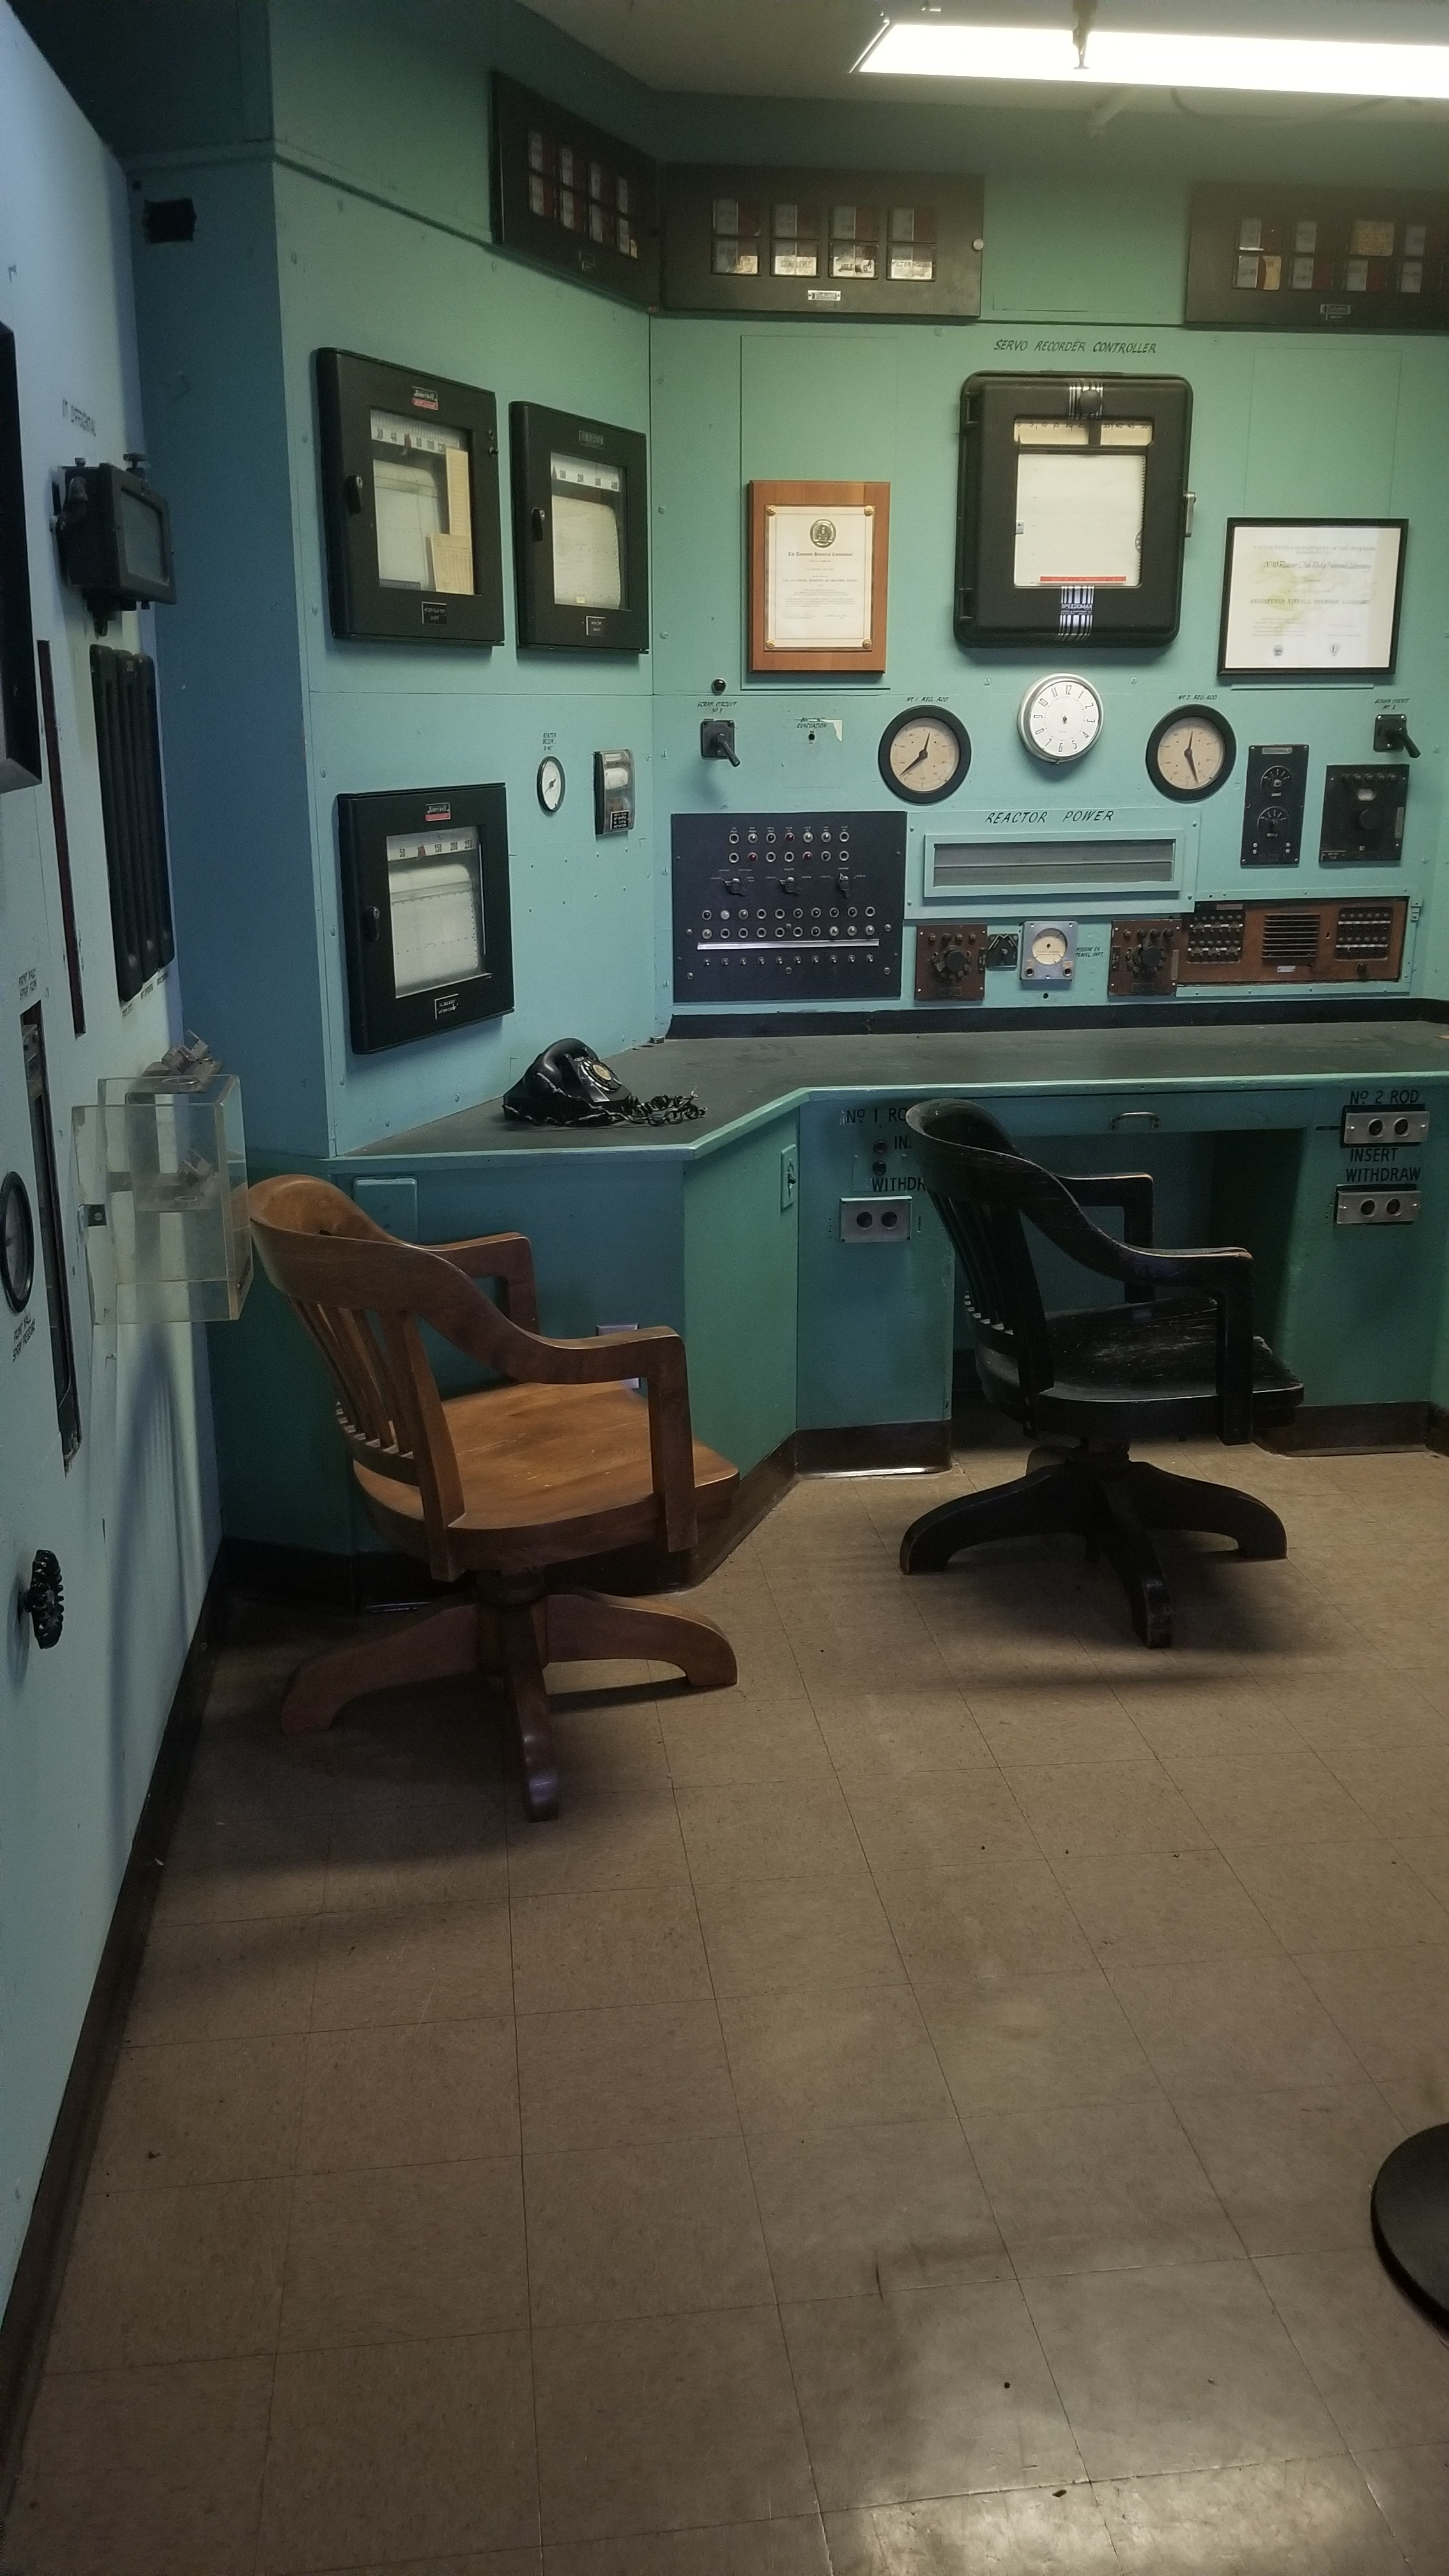 The Graphite Reactor